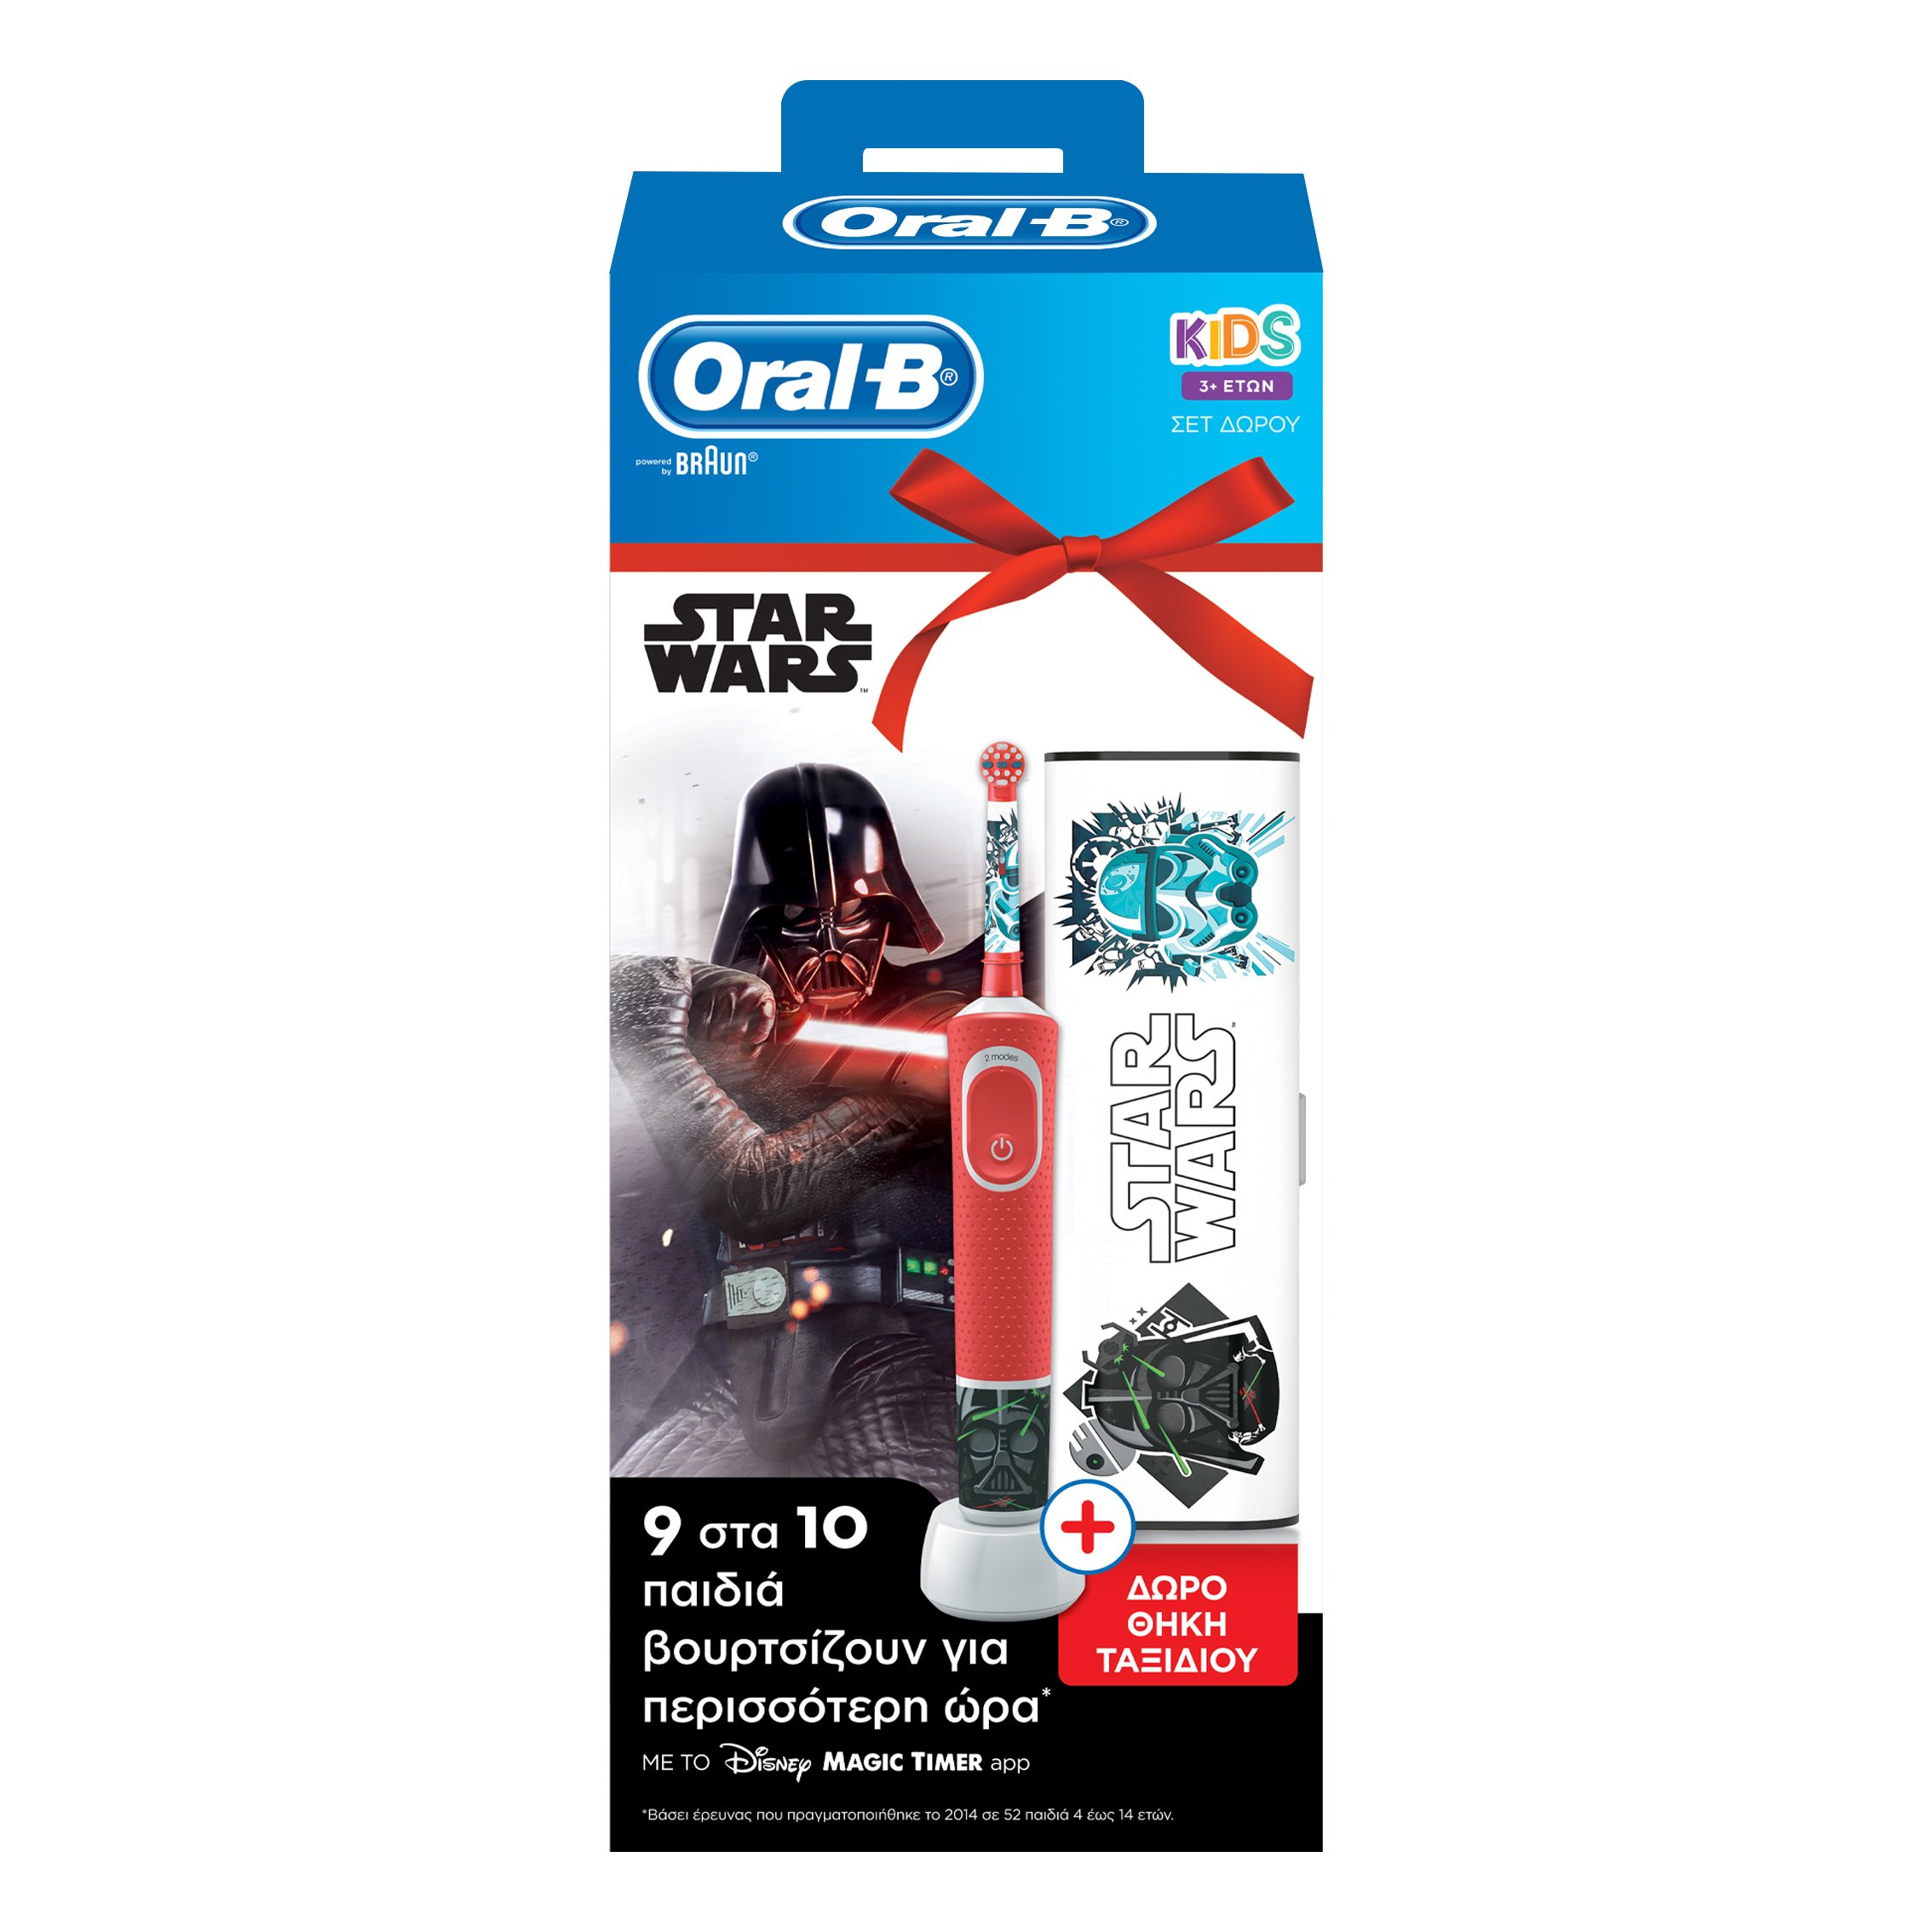 Oral-B Vitality Kids Star Wars 3+ Years, Παιδική Ηλεκτρική Οδοντόβουρτσα & Δώρο Travel Case